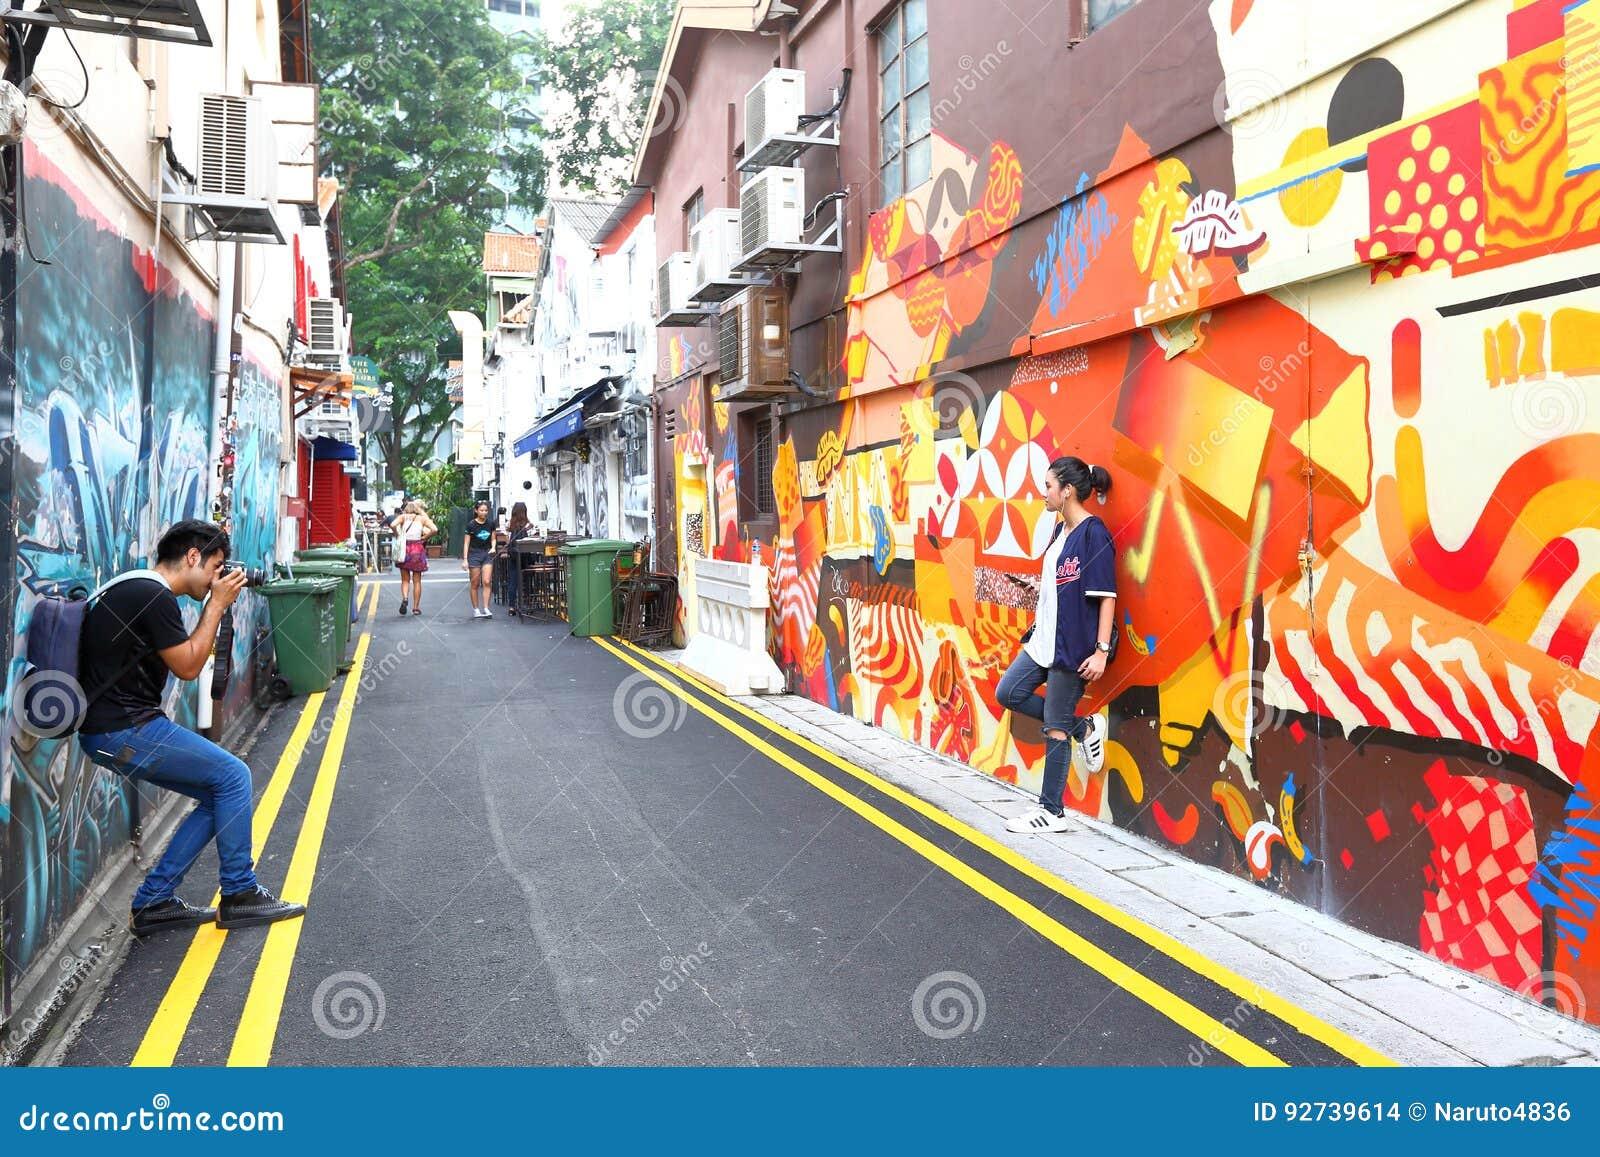 Singapore Graffiti Near Haji Lane